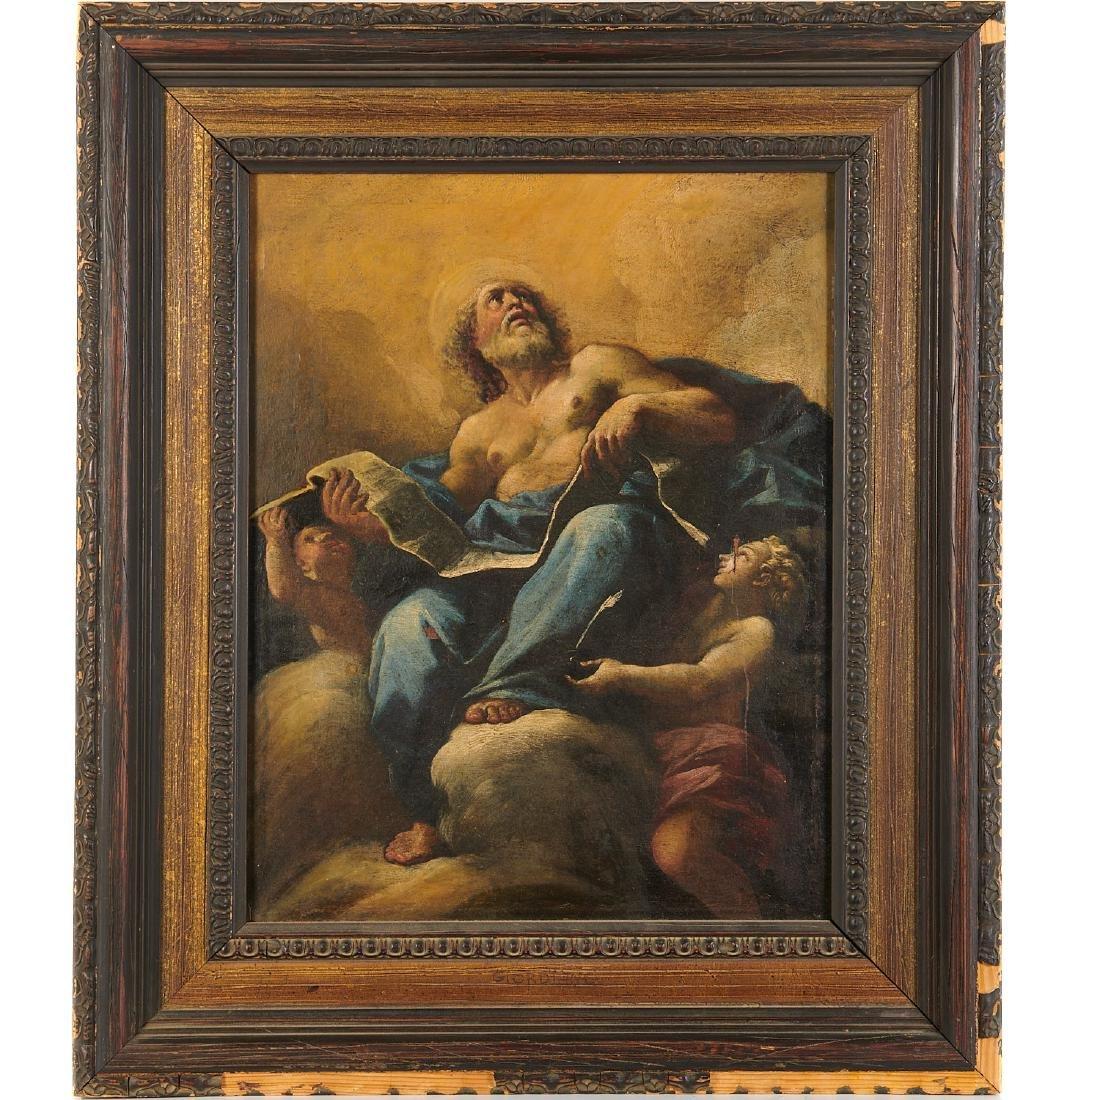 Luca Giordano (attrib.), painting